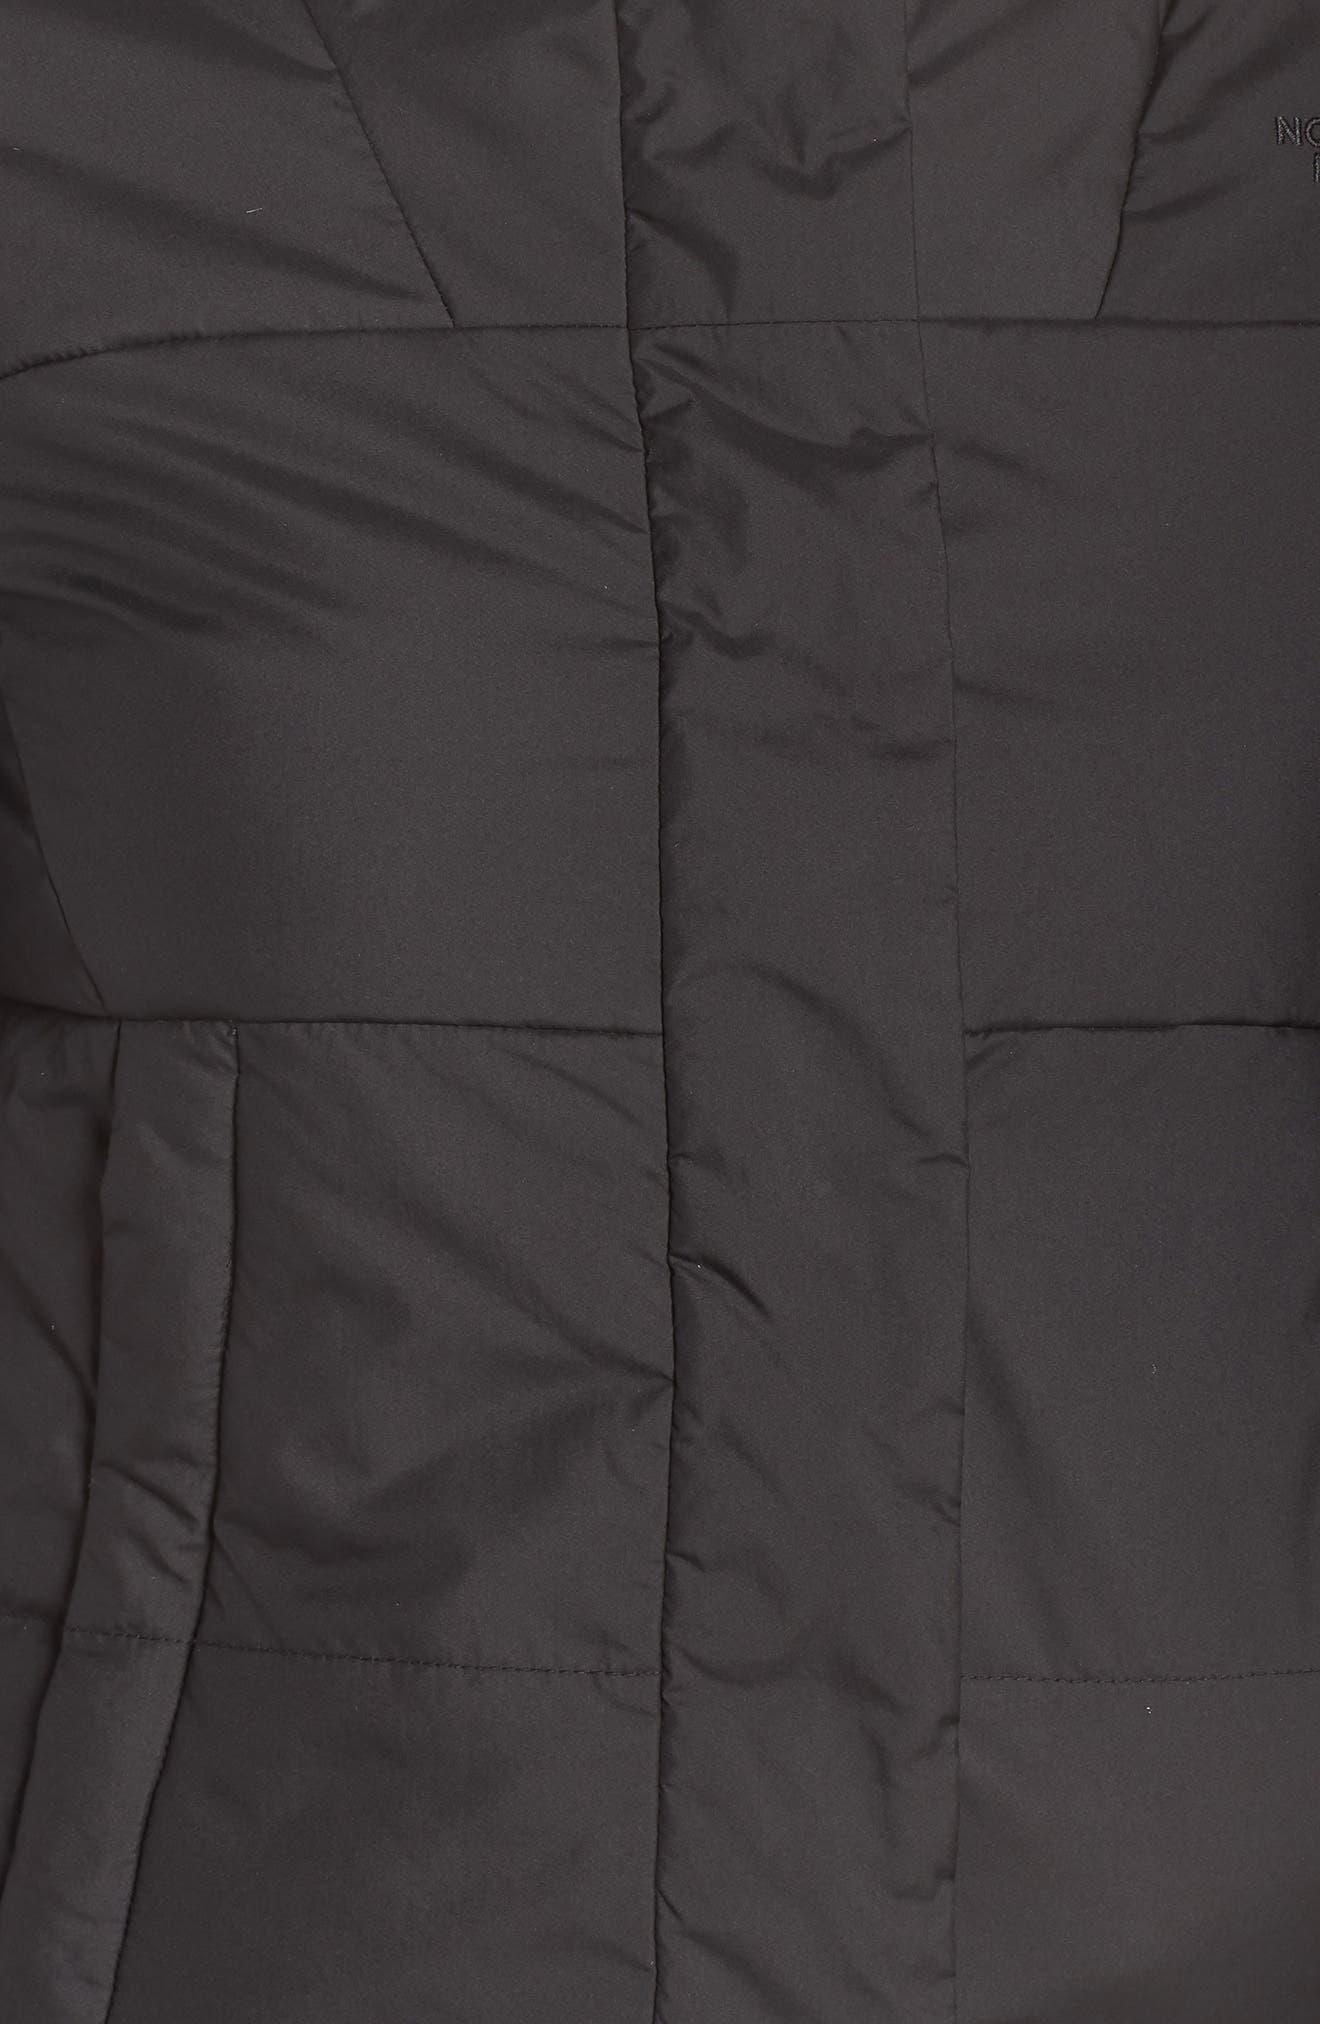 THE NORTH FACE,                             Femtastic Heatseeker Insulated Jacket,                             Alternate thumbnail 7, color,                             TNF BLACK